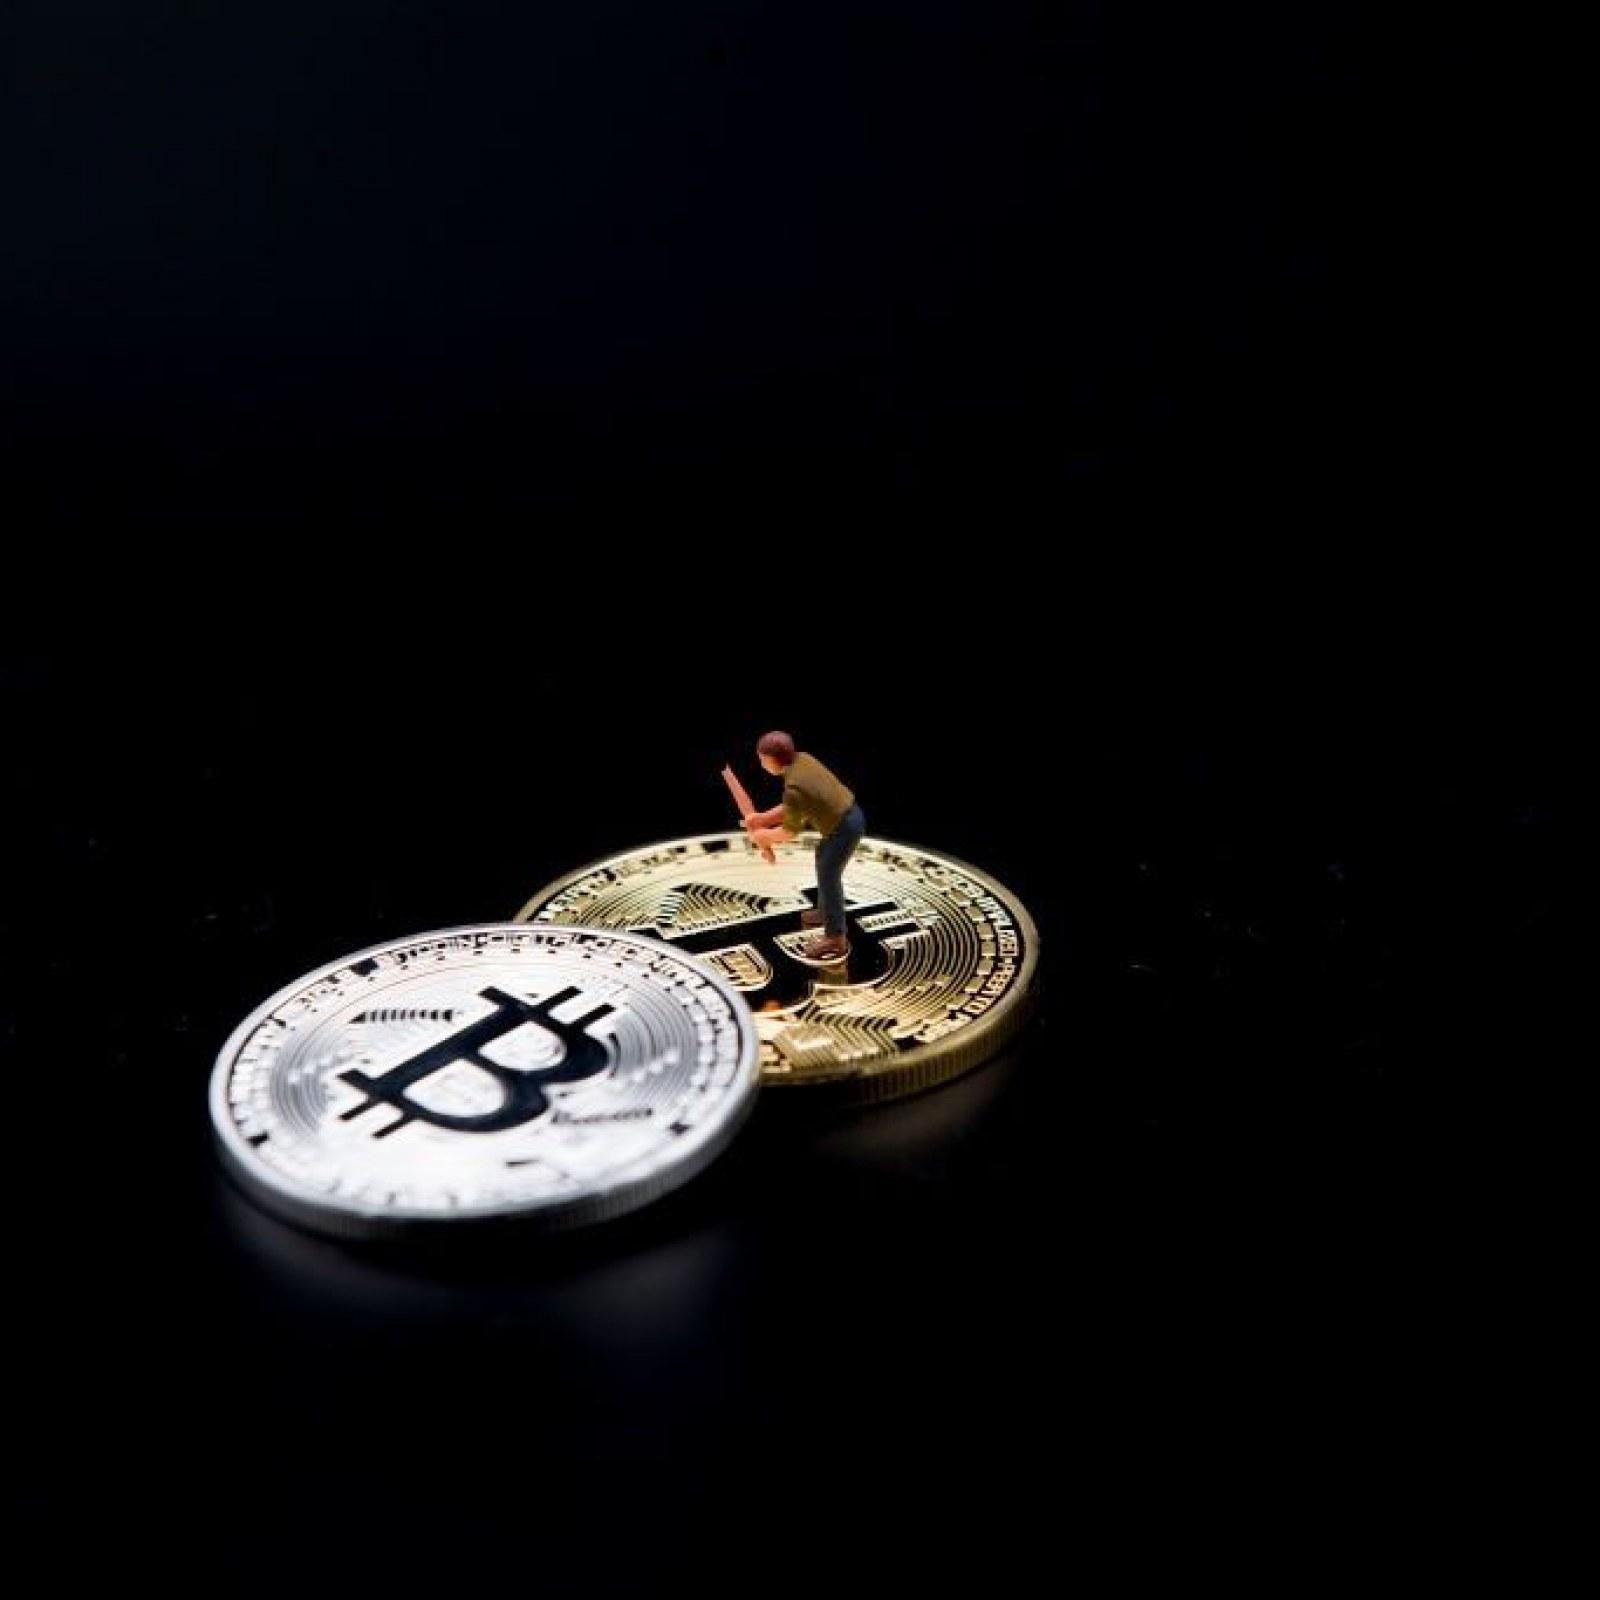 adguard cryptocurrency mining